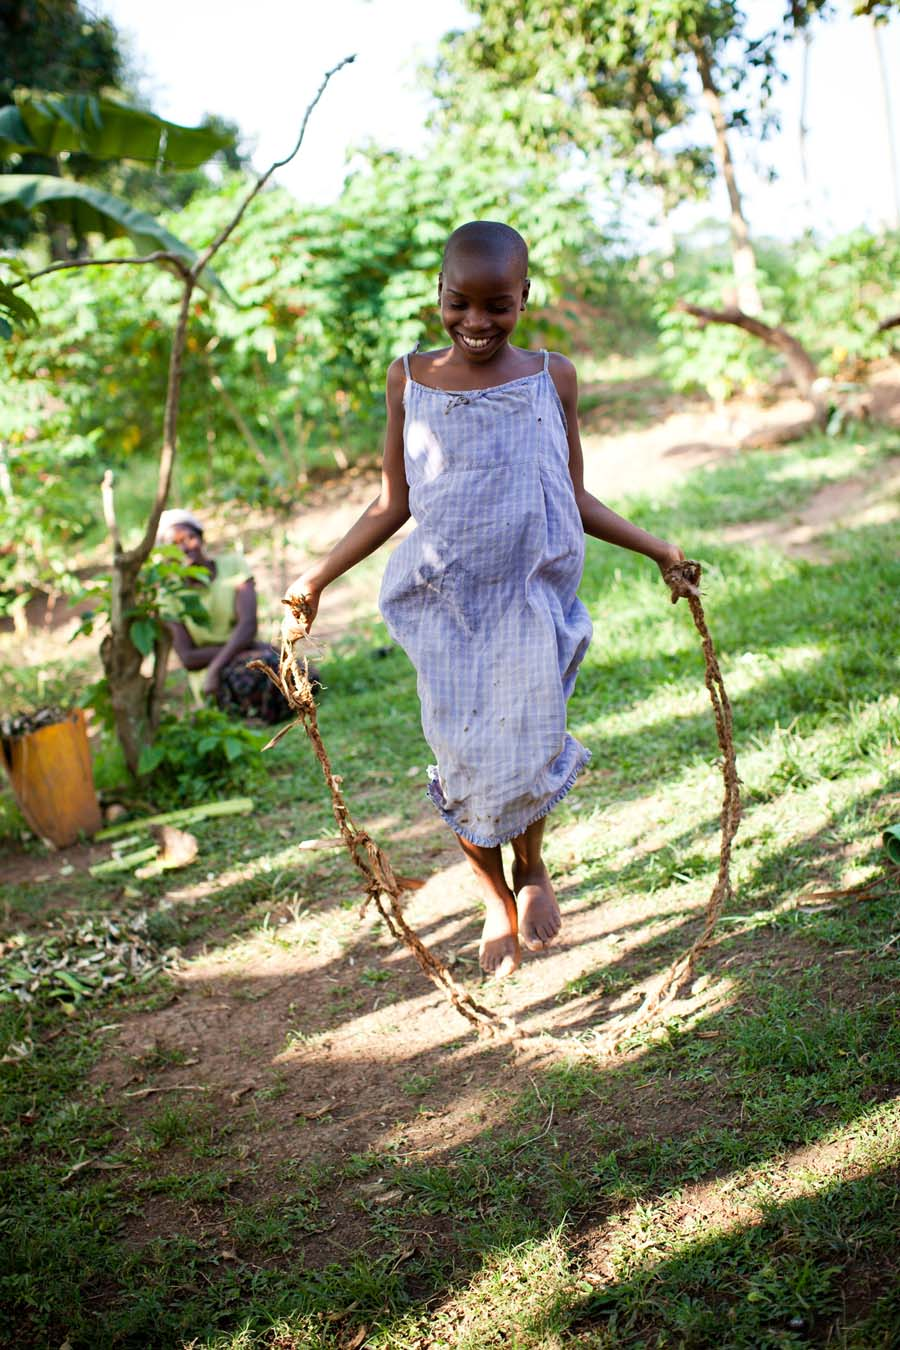 jessicadavisphotography.com | Jessica Davis Photography | Portrait Work in Uganda| Travel Photographer | World Event Photographs 6 (9).jpg